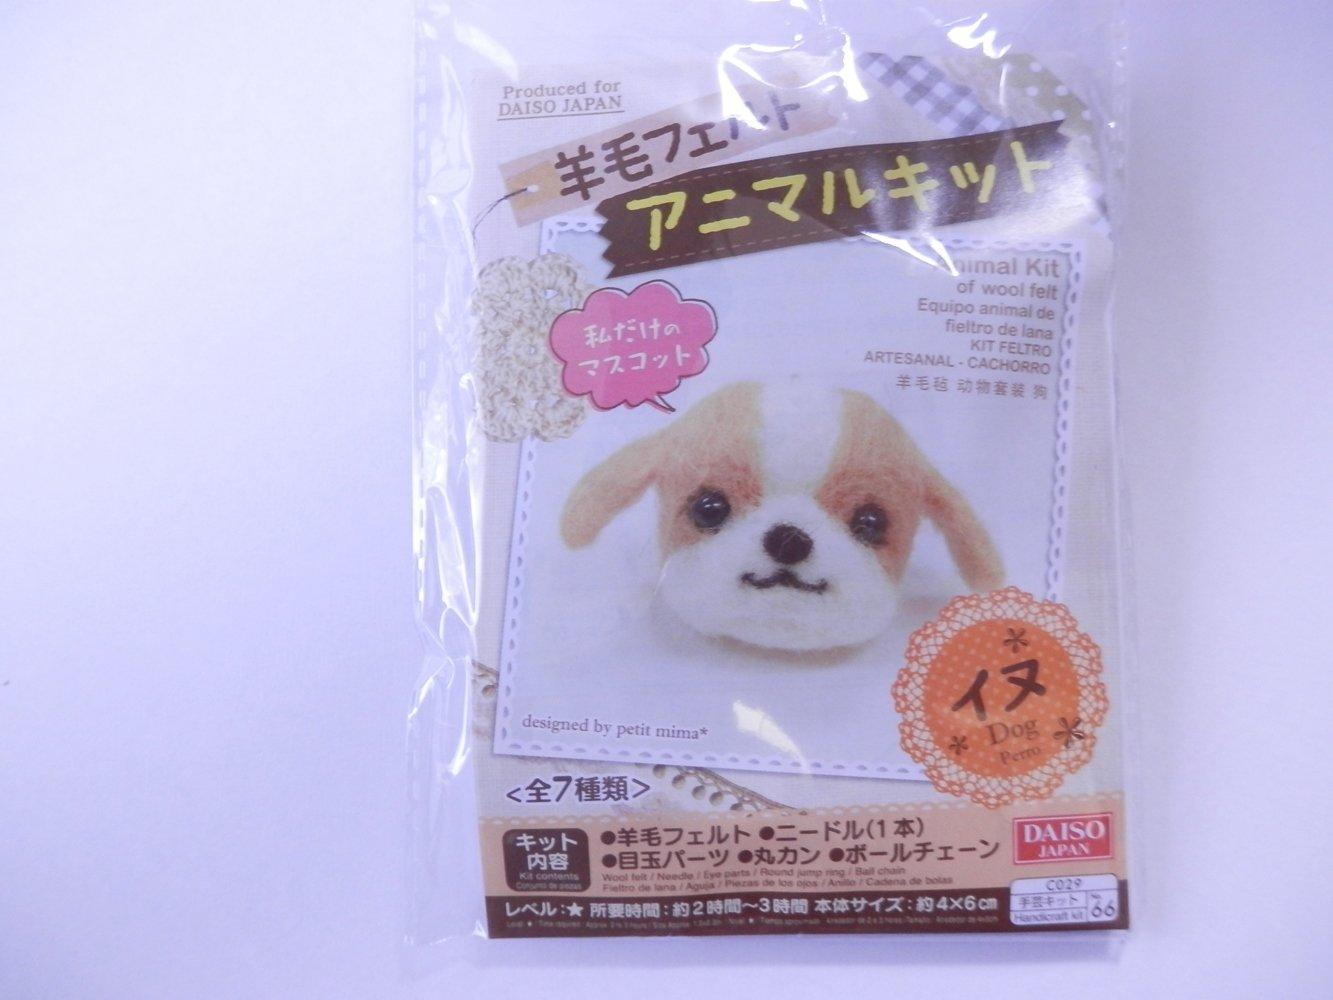 Daiso Japan DIY Animal Key Chain Kit of Wool Felt, Dog